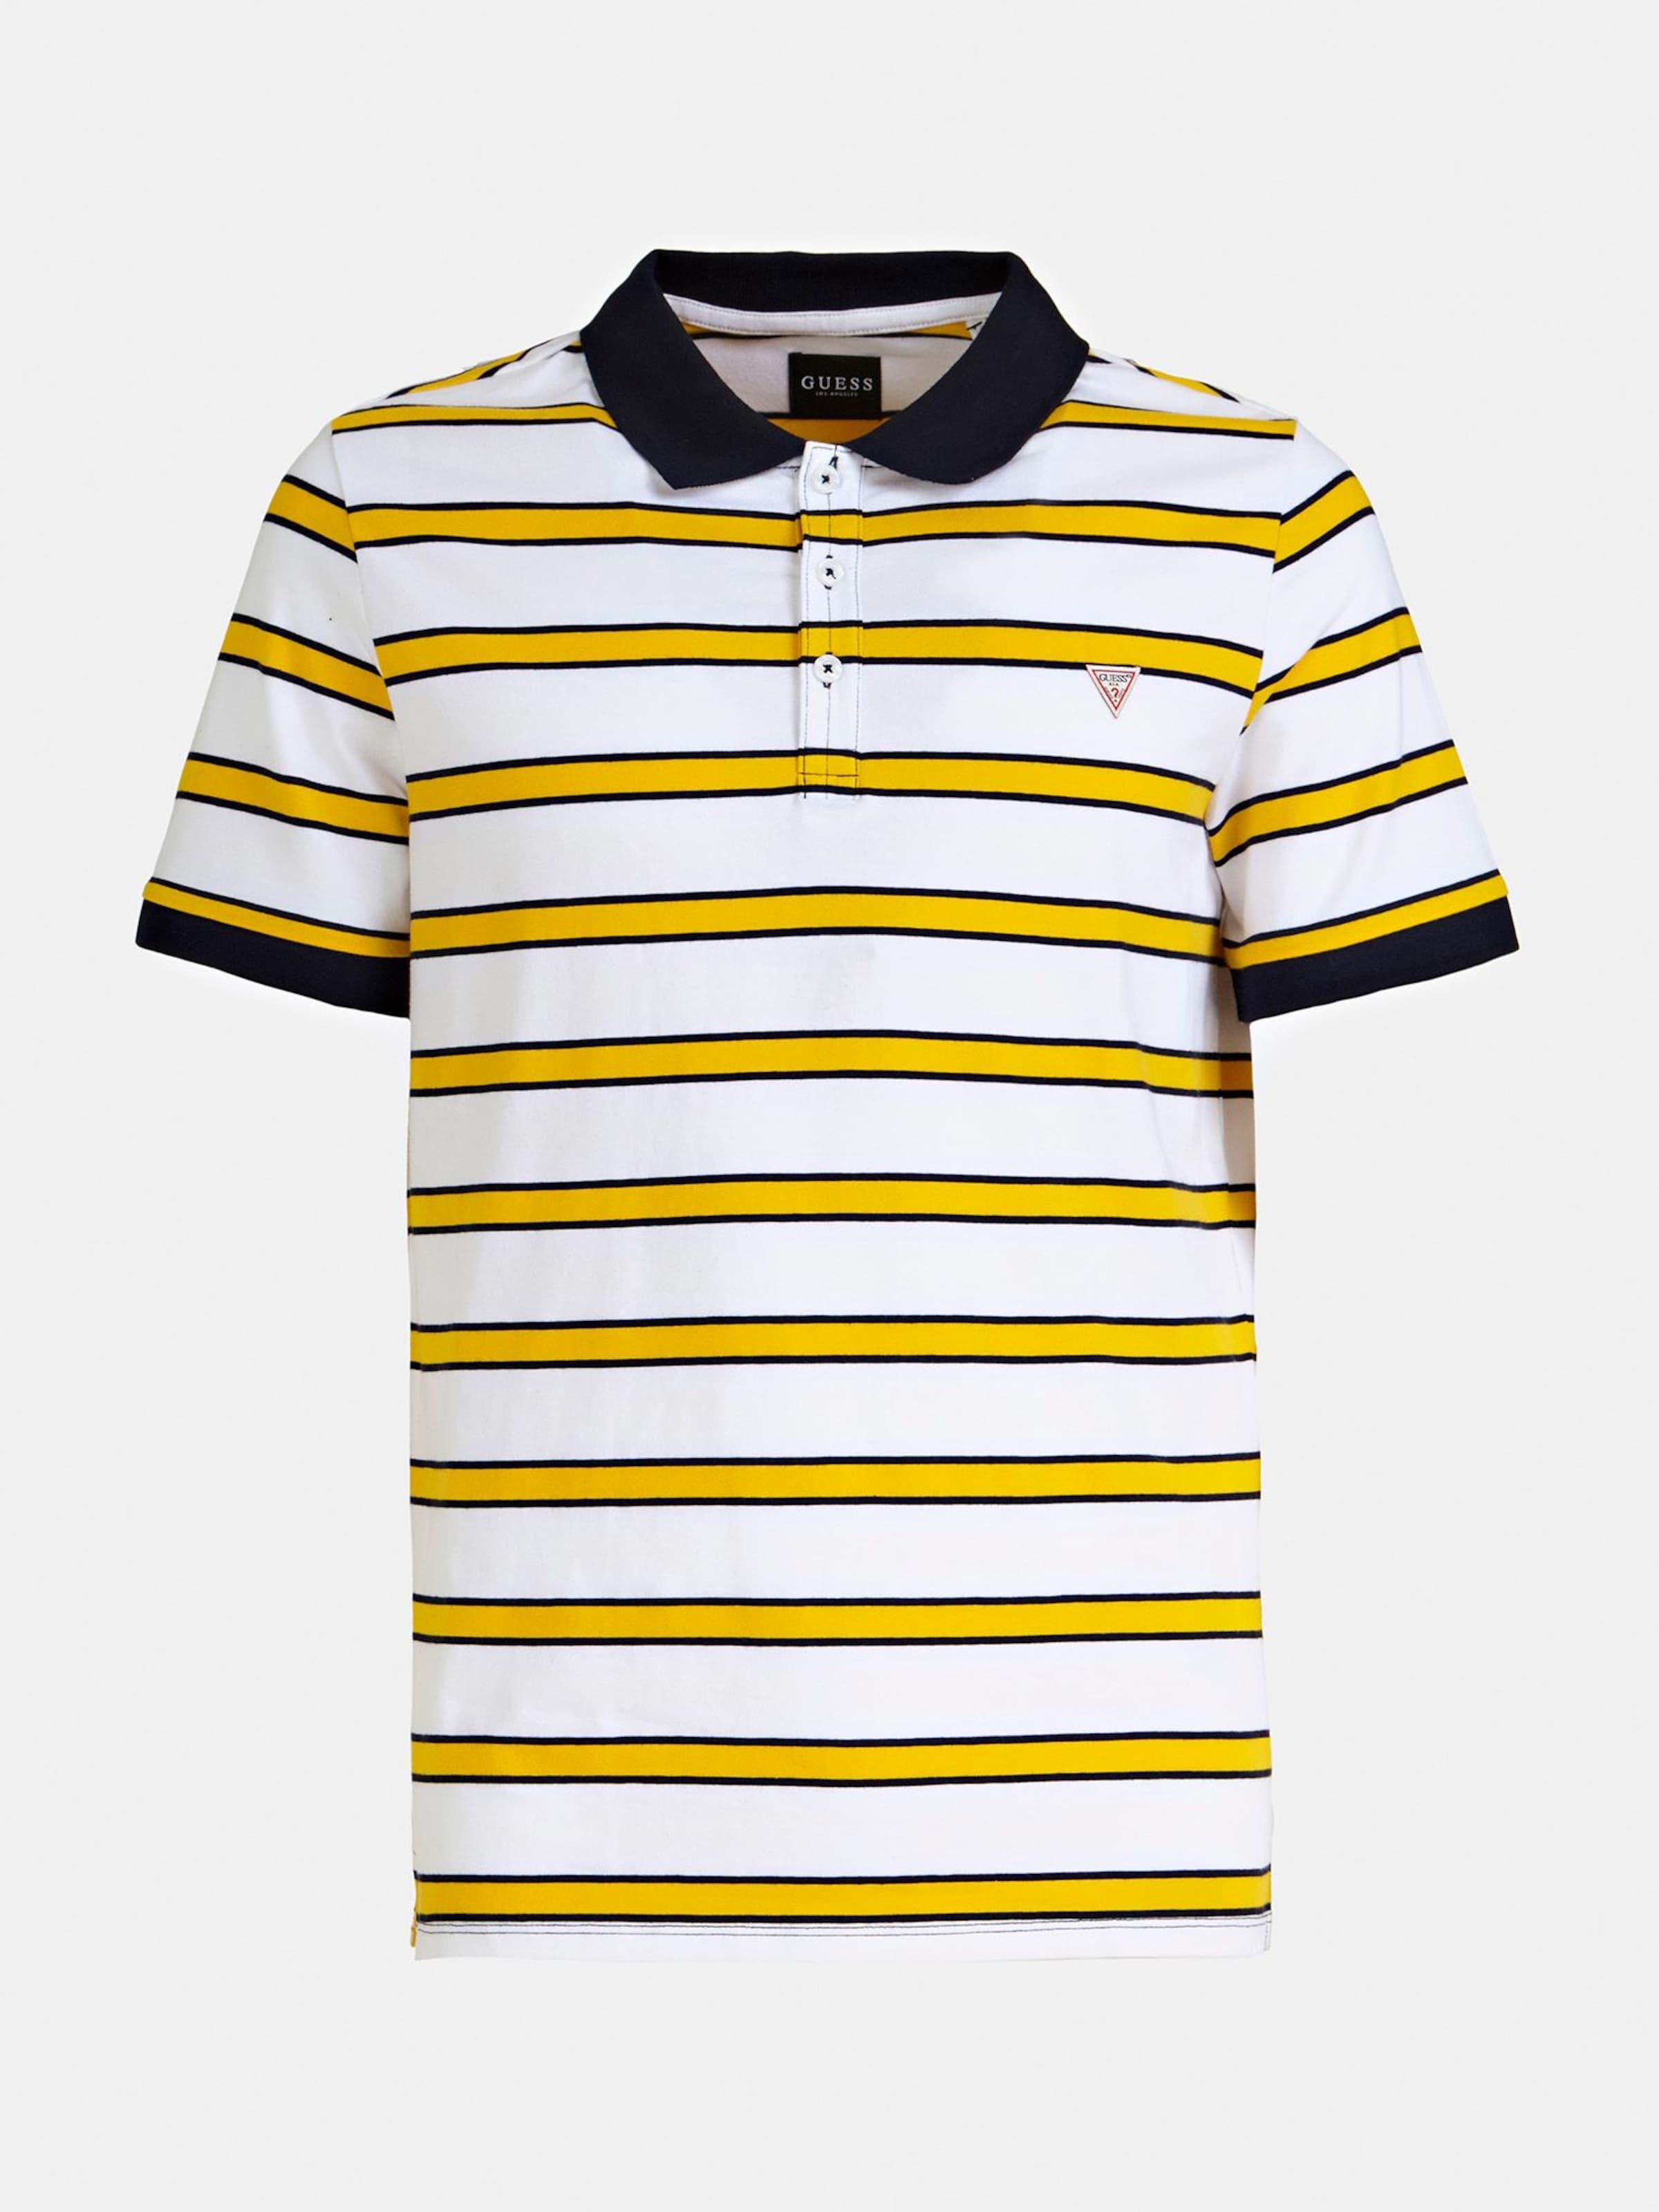 KobaltblauGelb Guess In KobaltblauGelb Weiß Shirt Shirt In In Guess Guess Shirt Weiß Nw8m0n